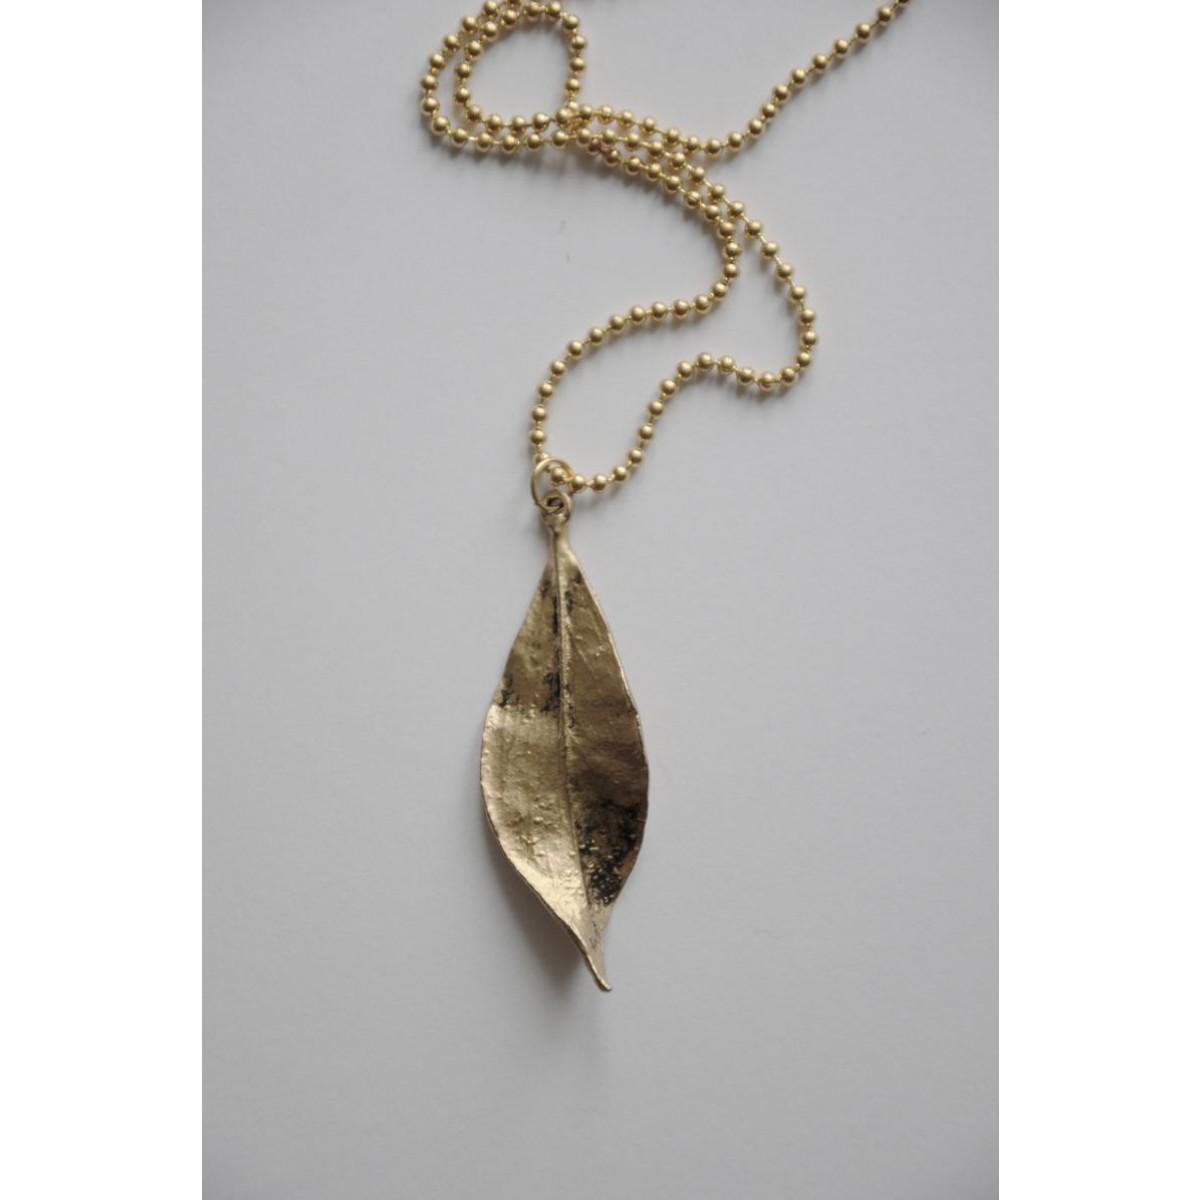 "nahili KETTE ""leafs"" lang & mit goldenem Blatt"